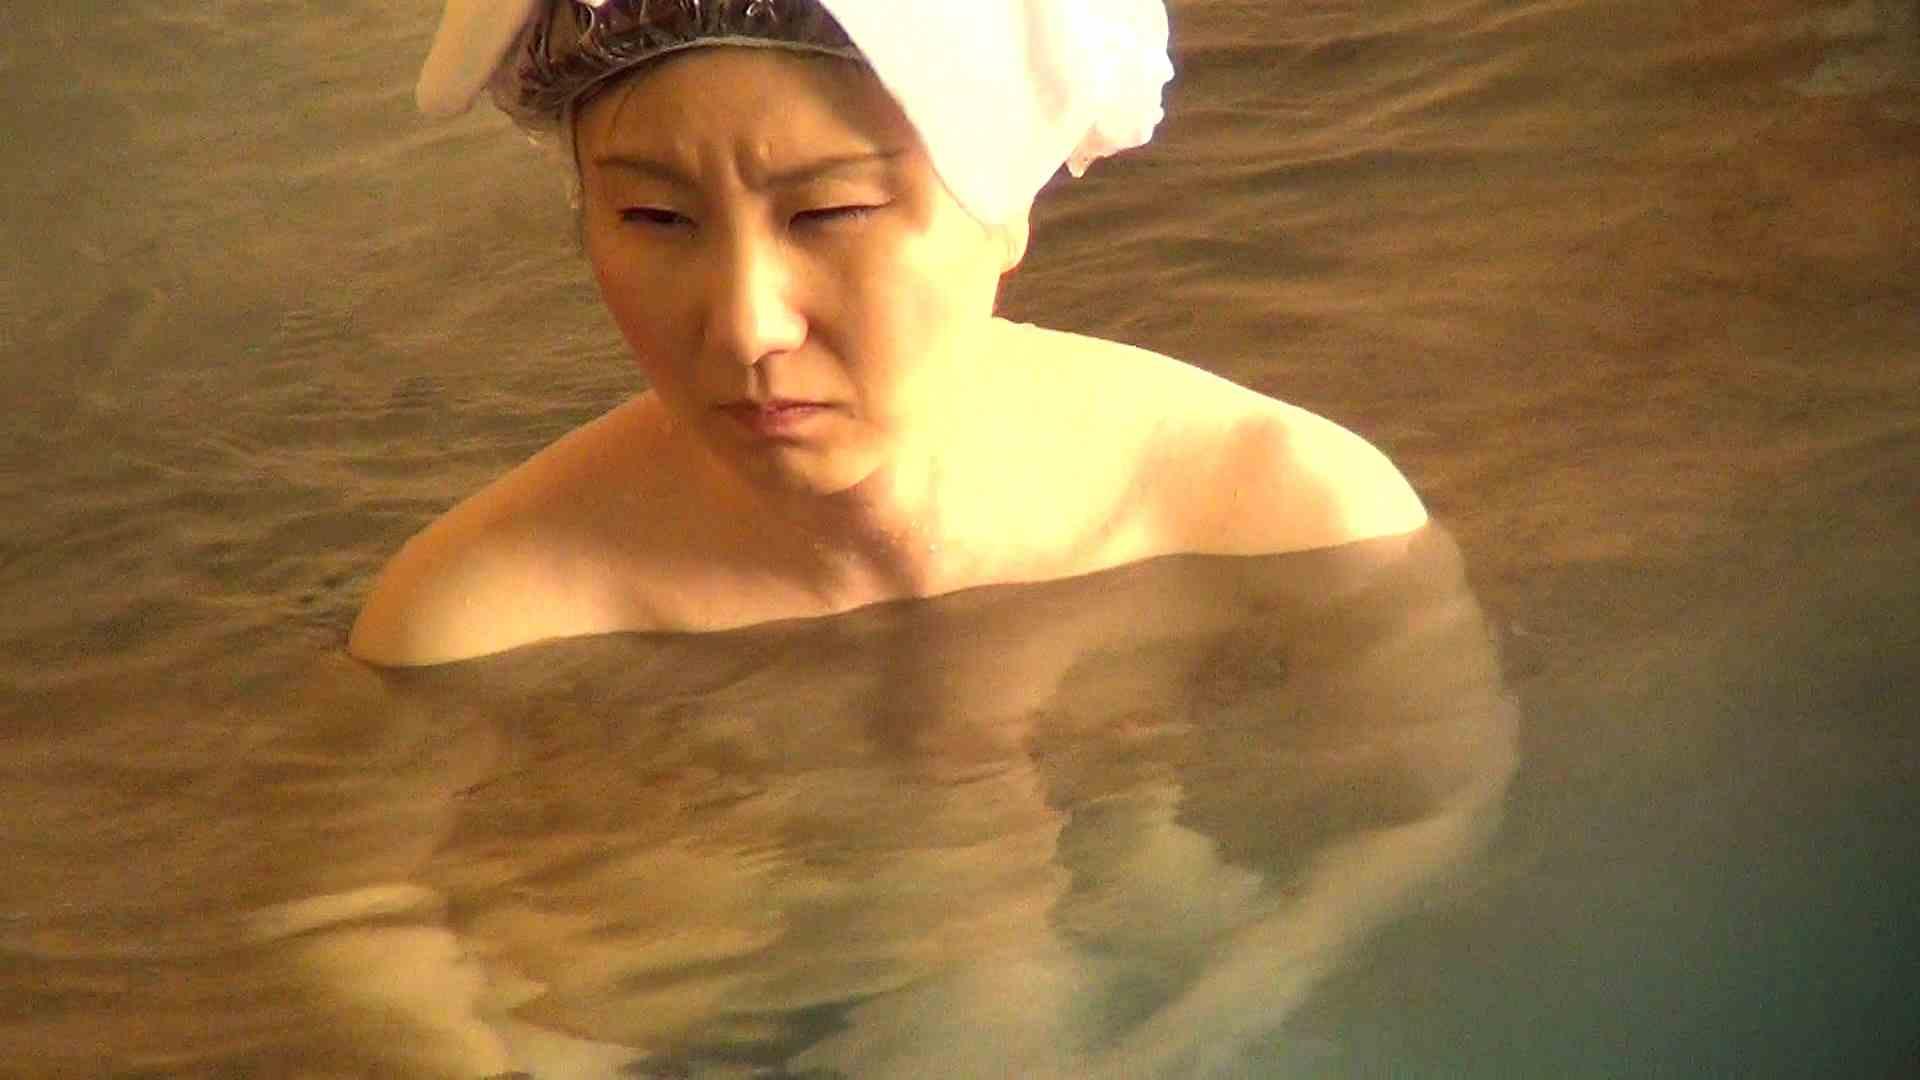 Aquaな露天風呂Vol.278 盗撮シリーズ | 露天風呂編  100PIX 59